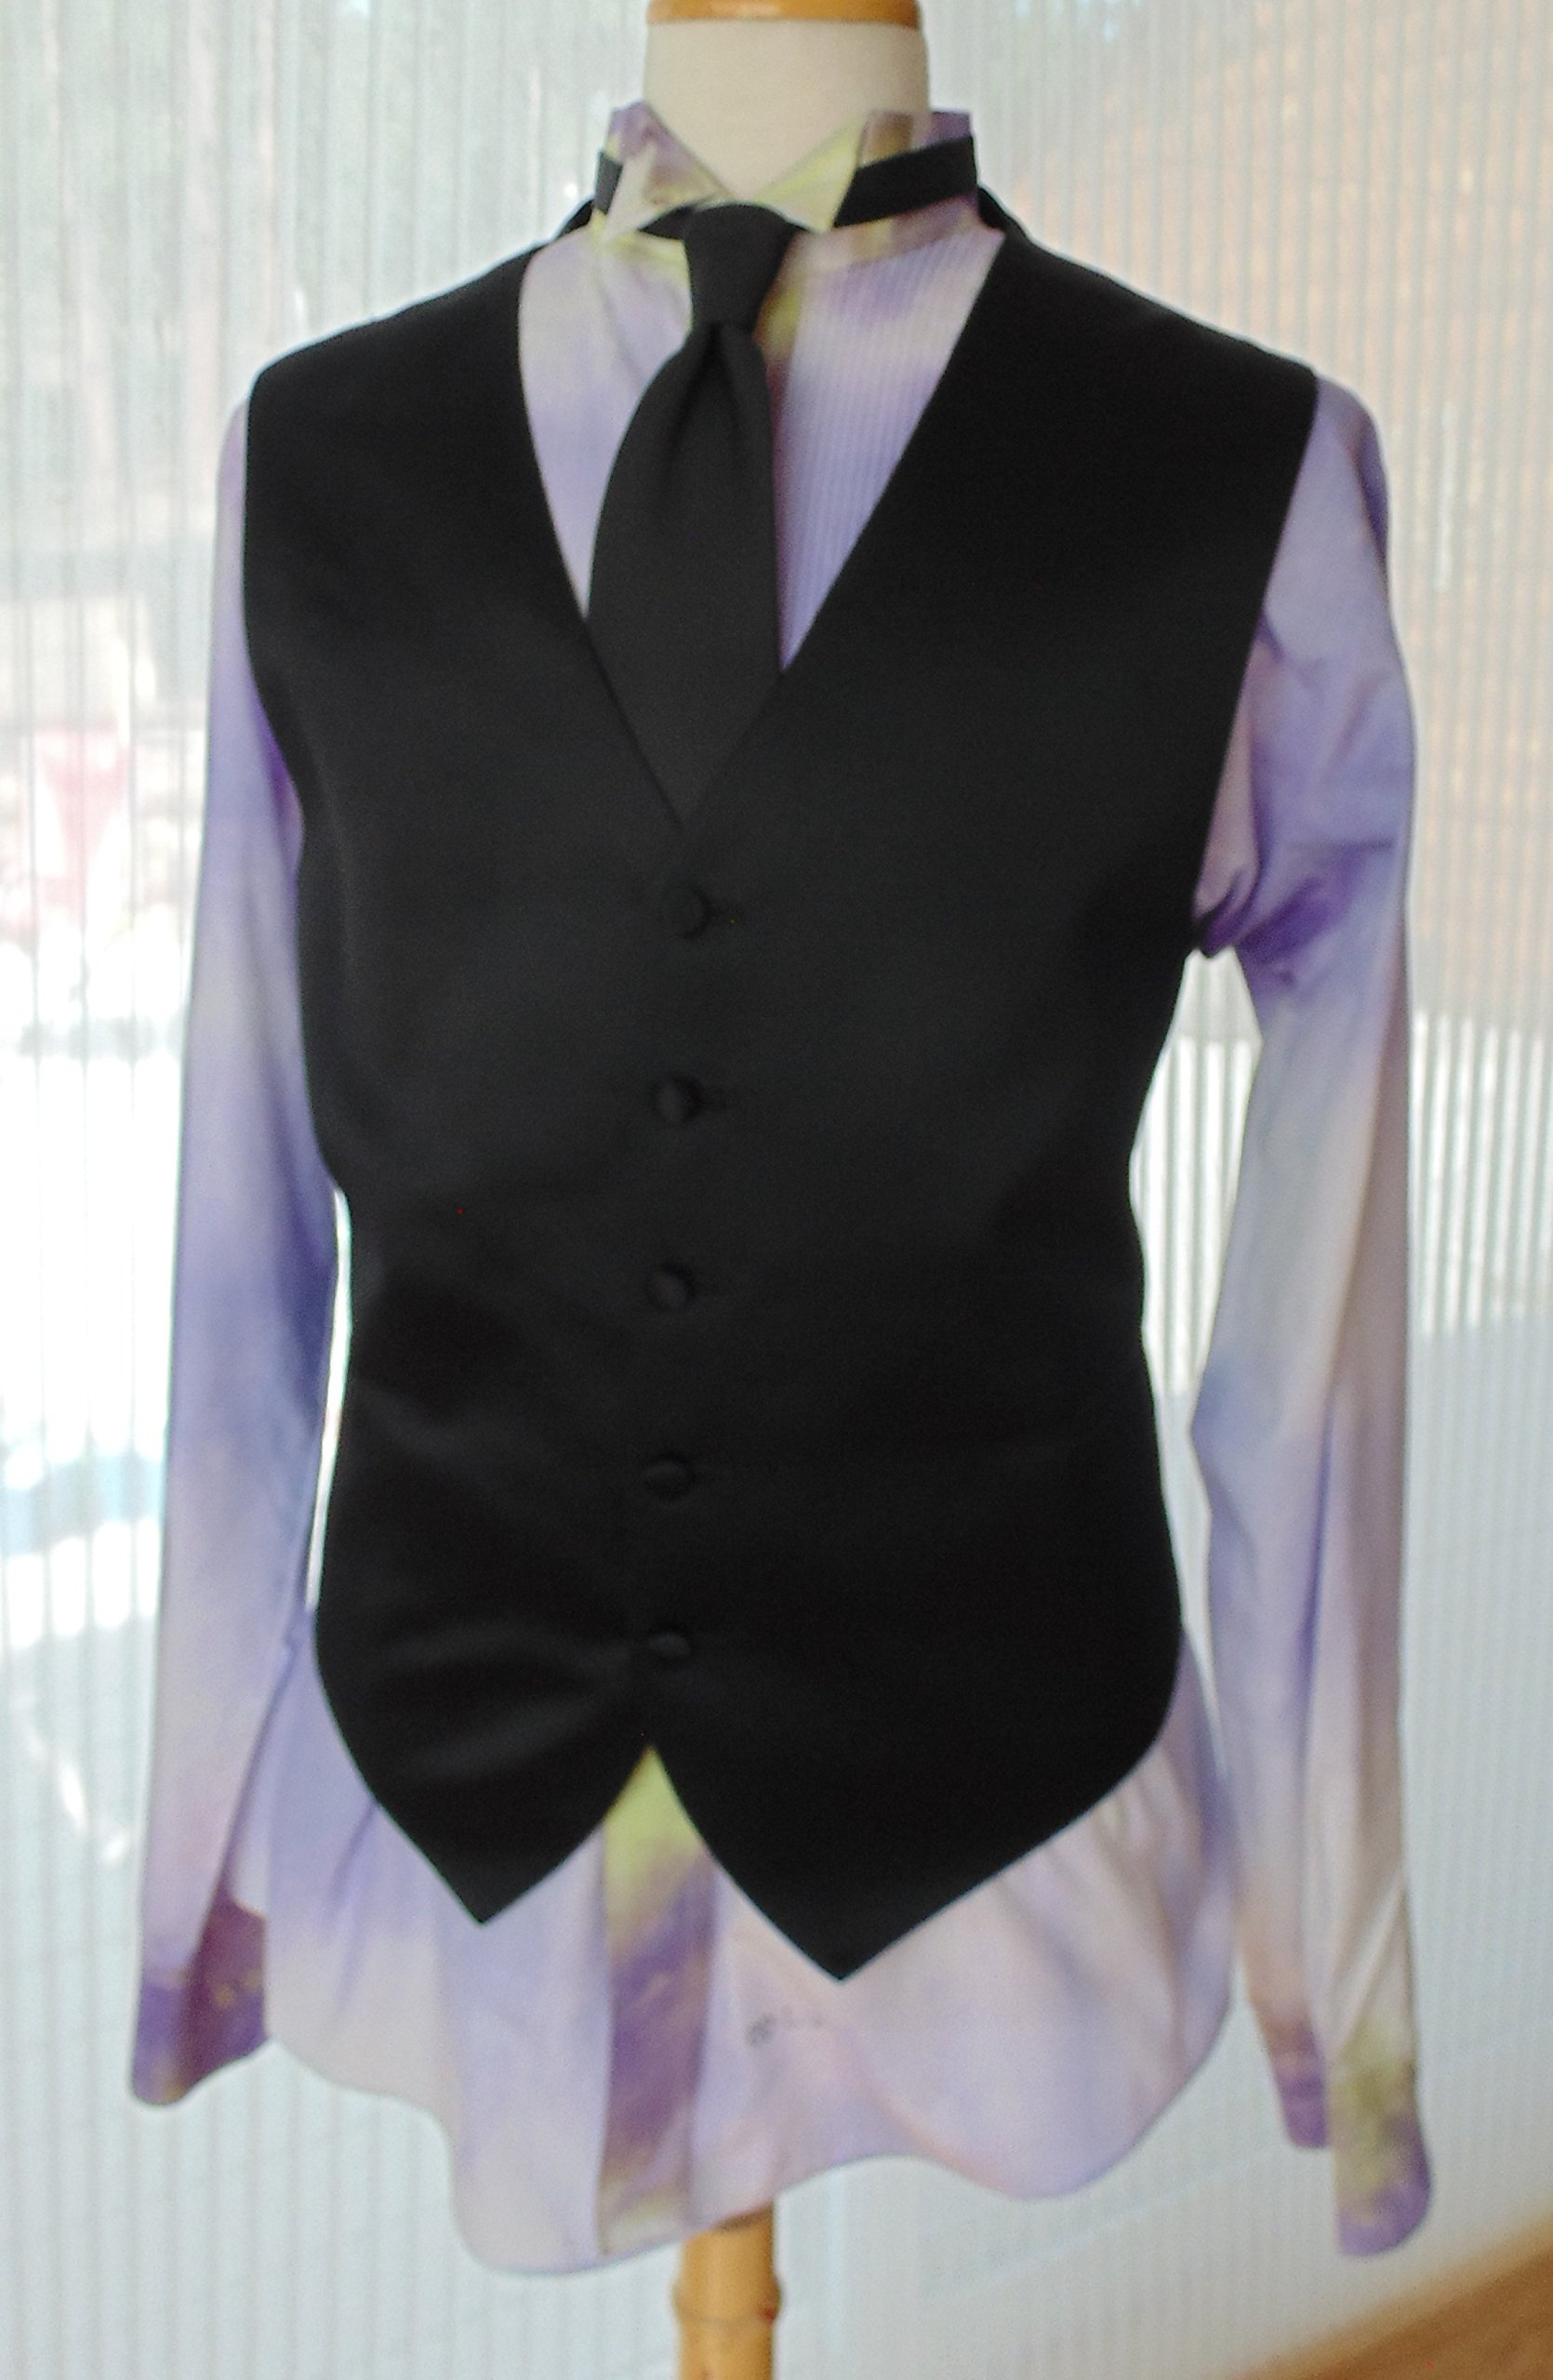 Men's L 36-37 Hand Tie Dye Tuxedo Shirt